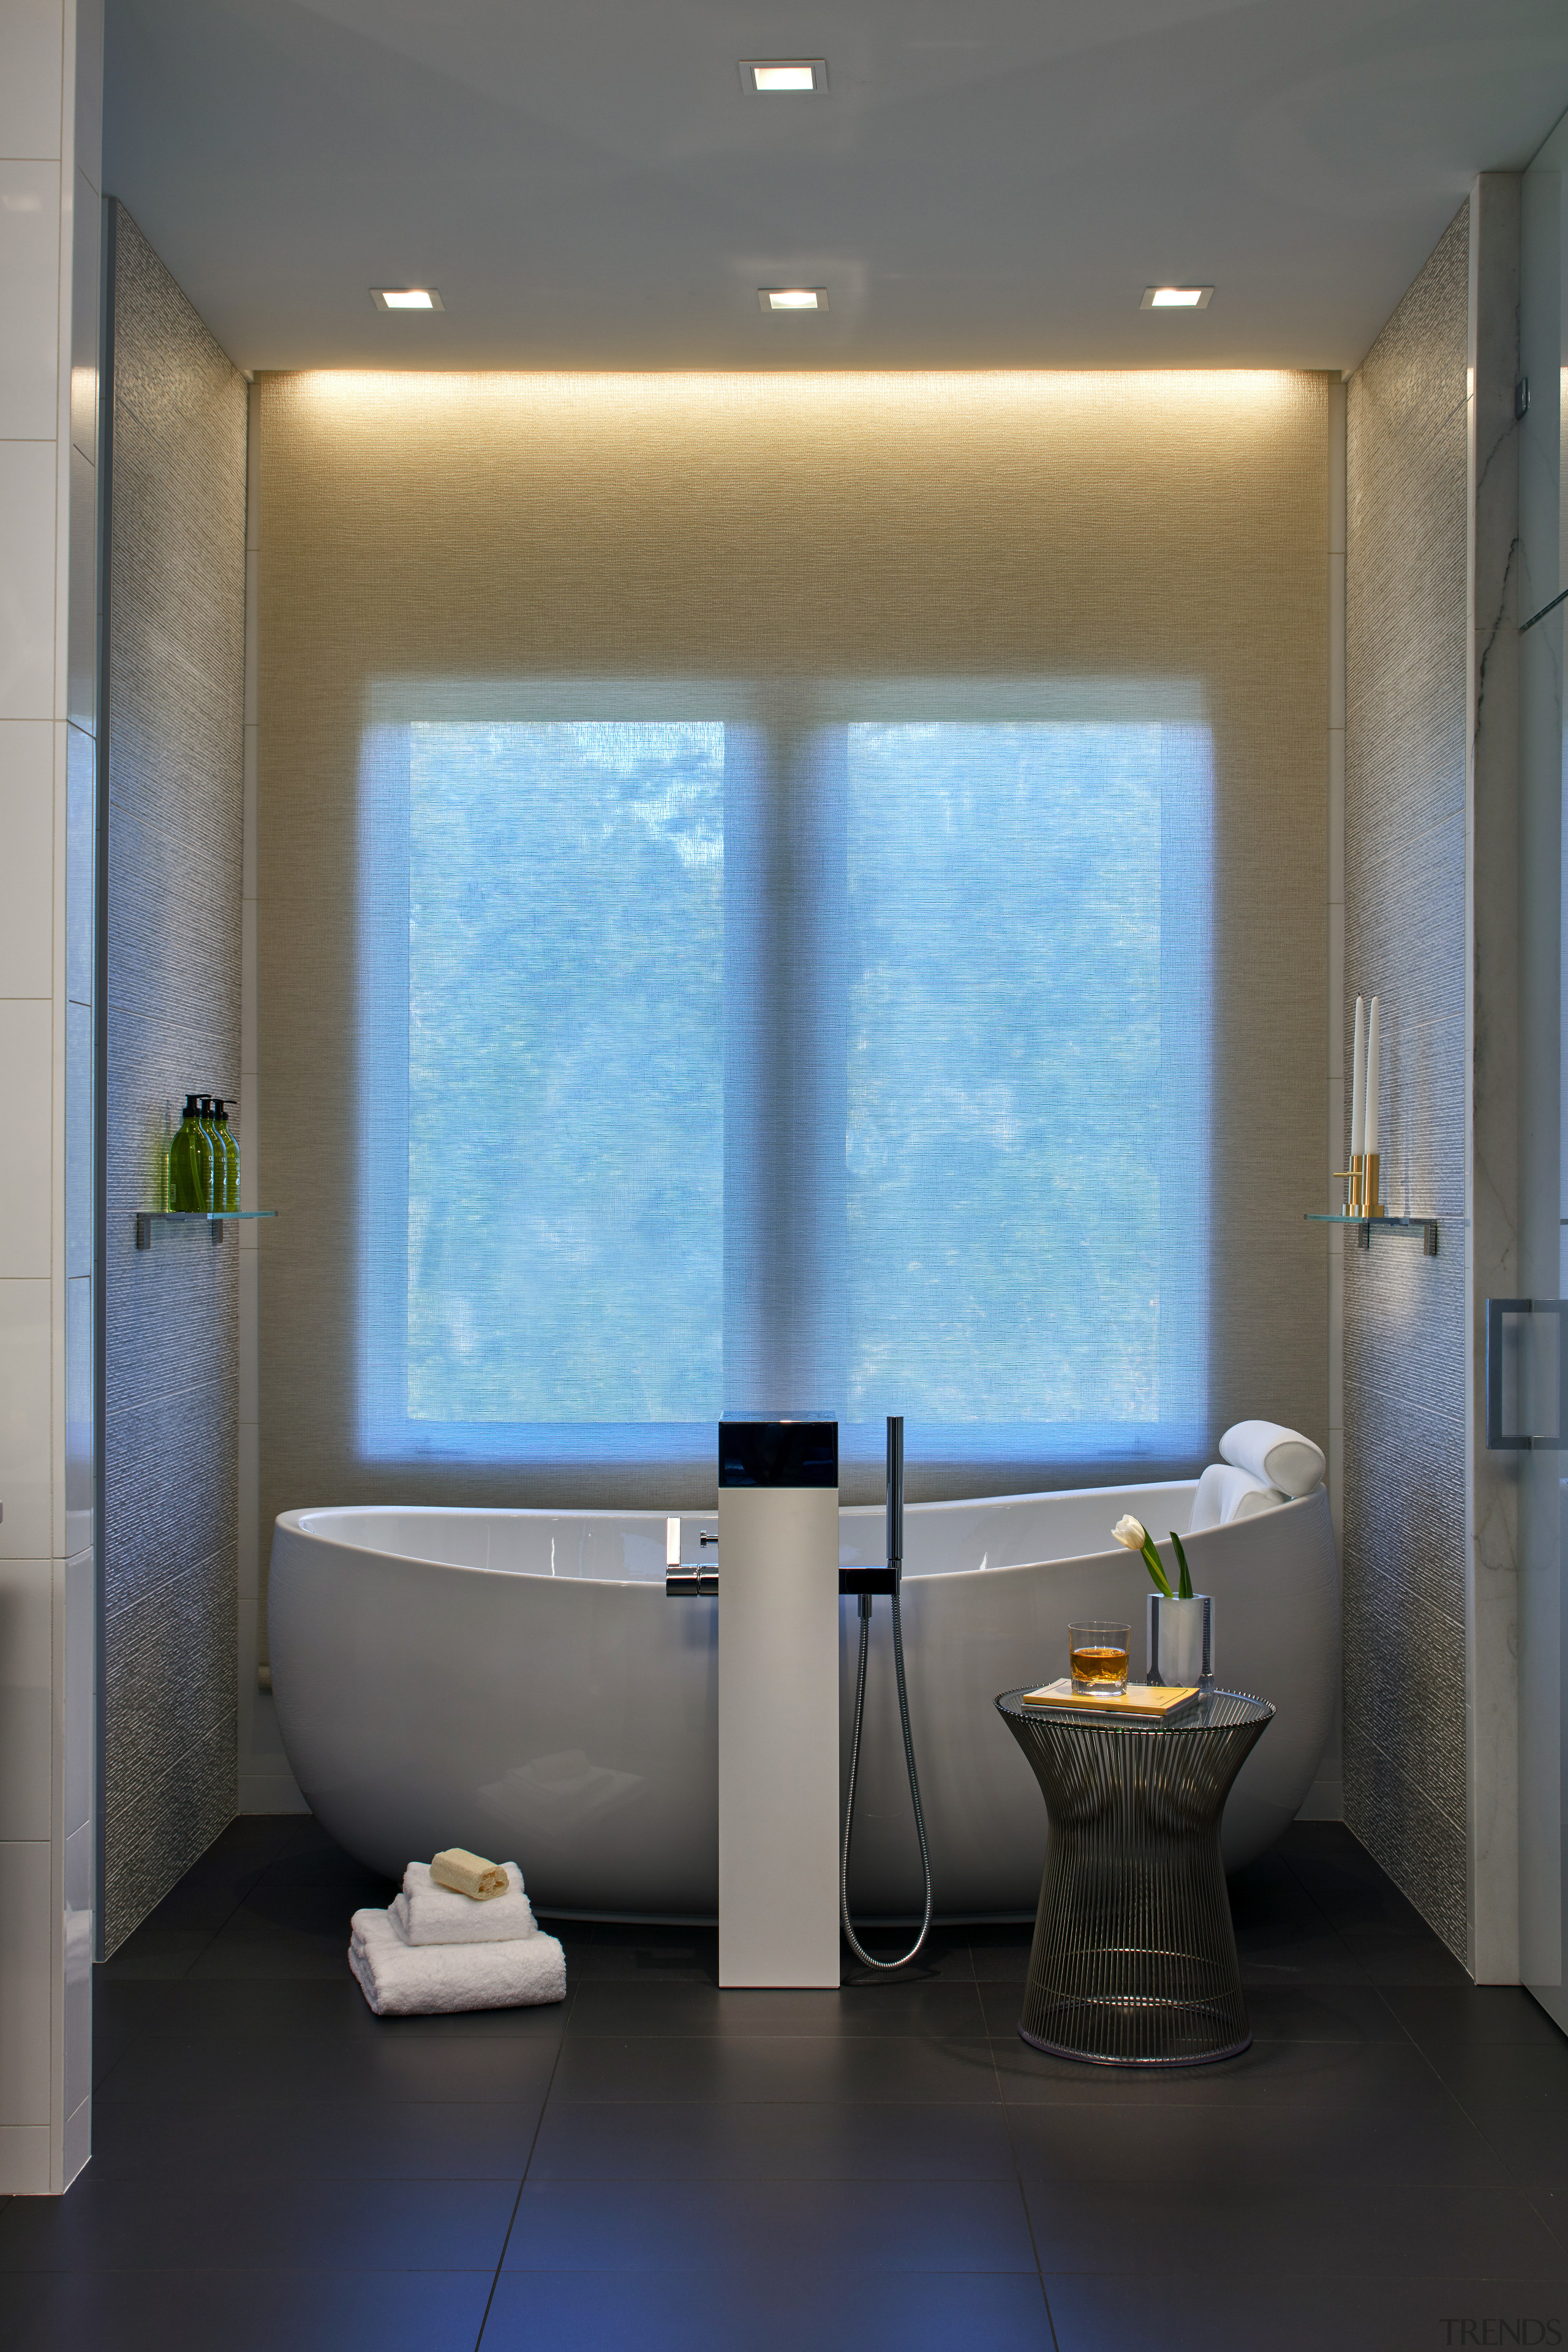 The luxury of pure symmetry is apparent in architecture, bathroom, ceiling, daylighting, interior design, plumbing fixture, room, toilet, window, gray